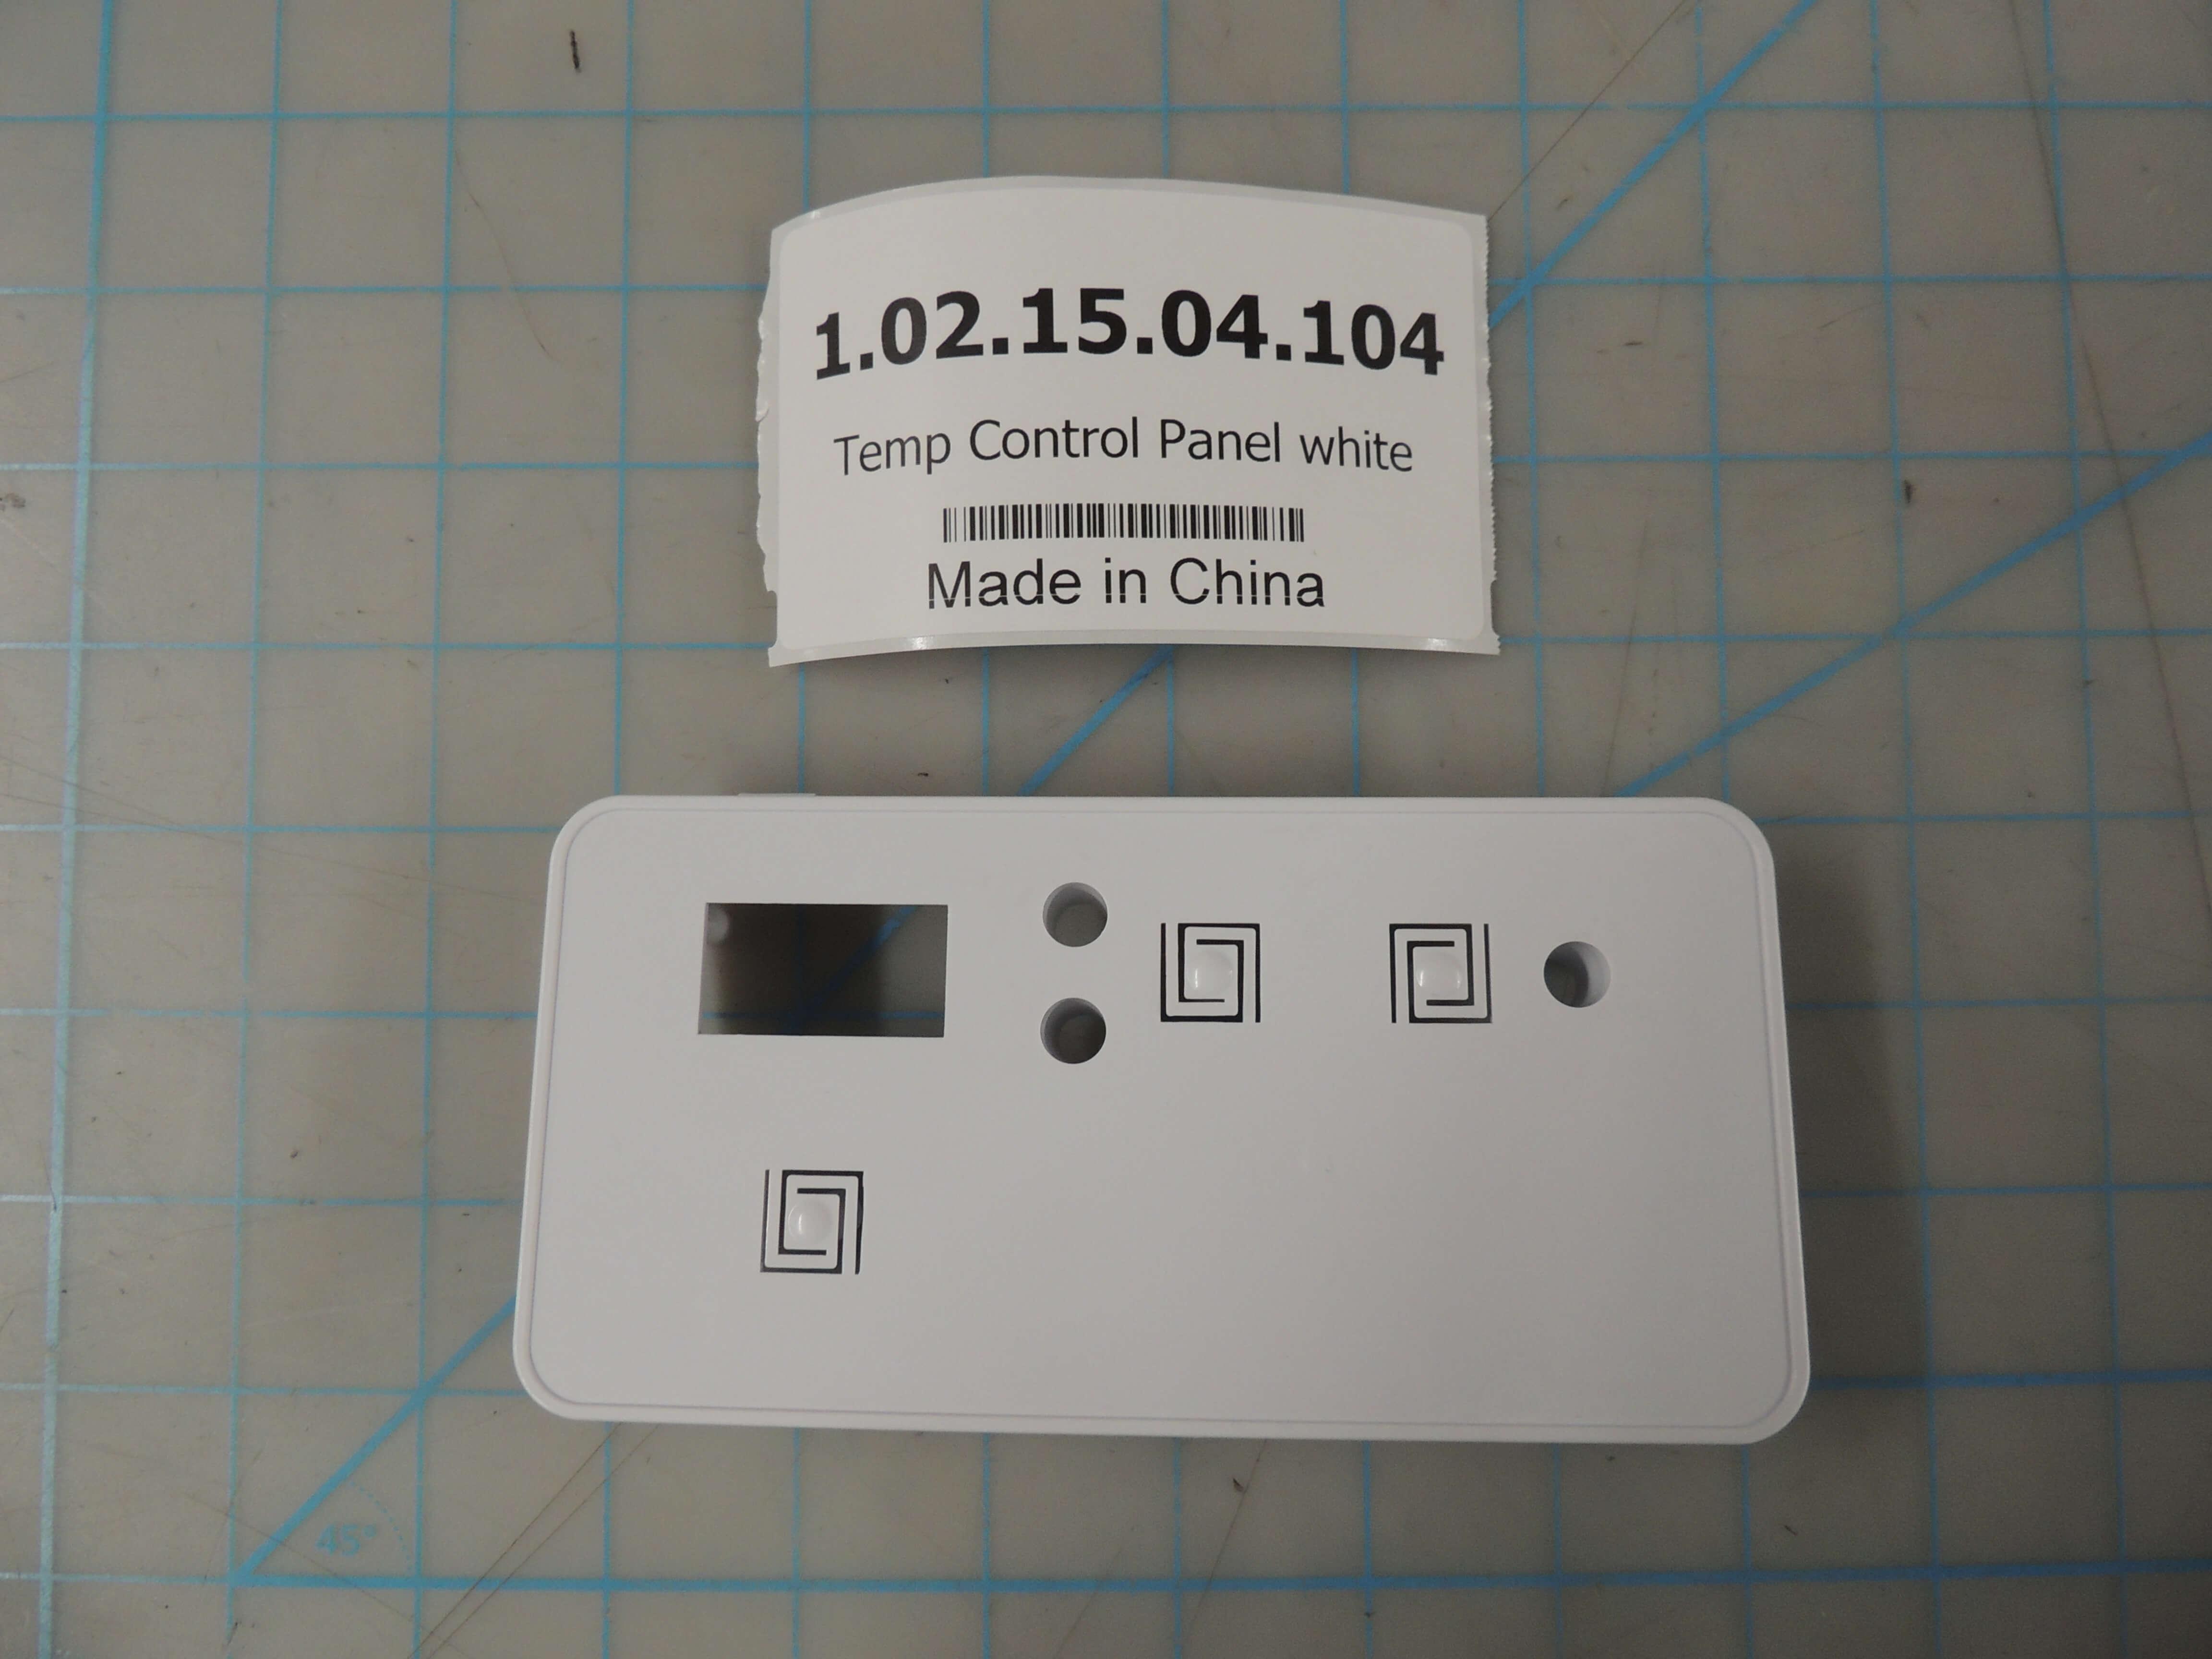 Temp Control Panel white